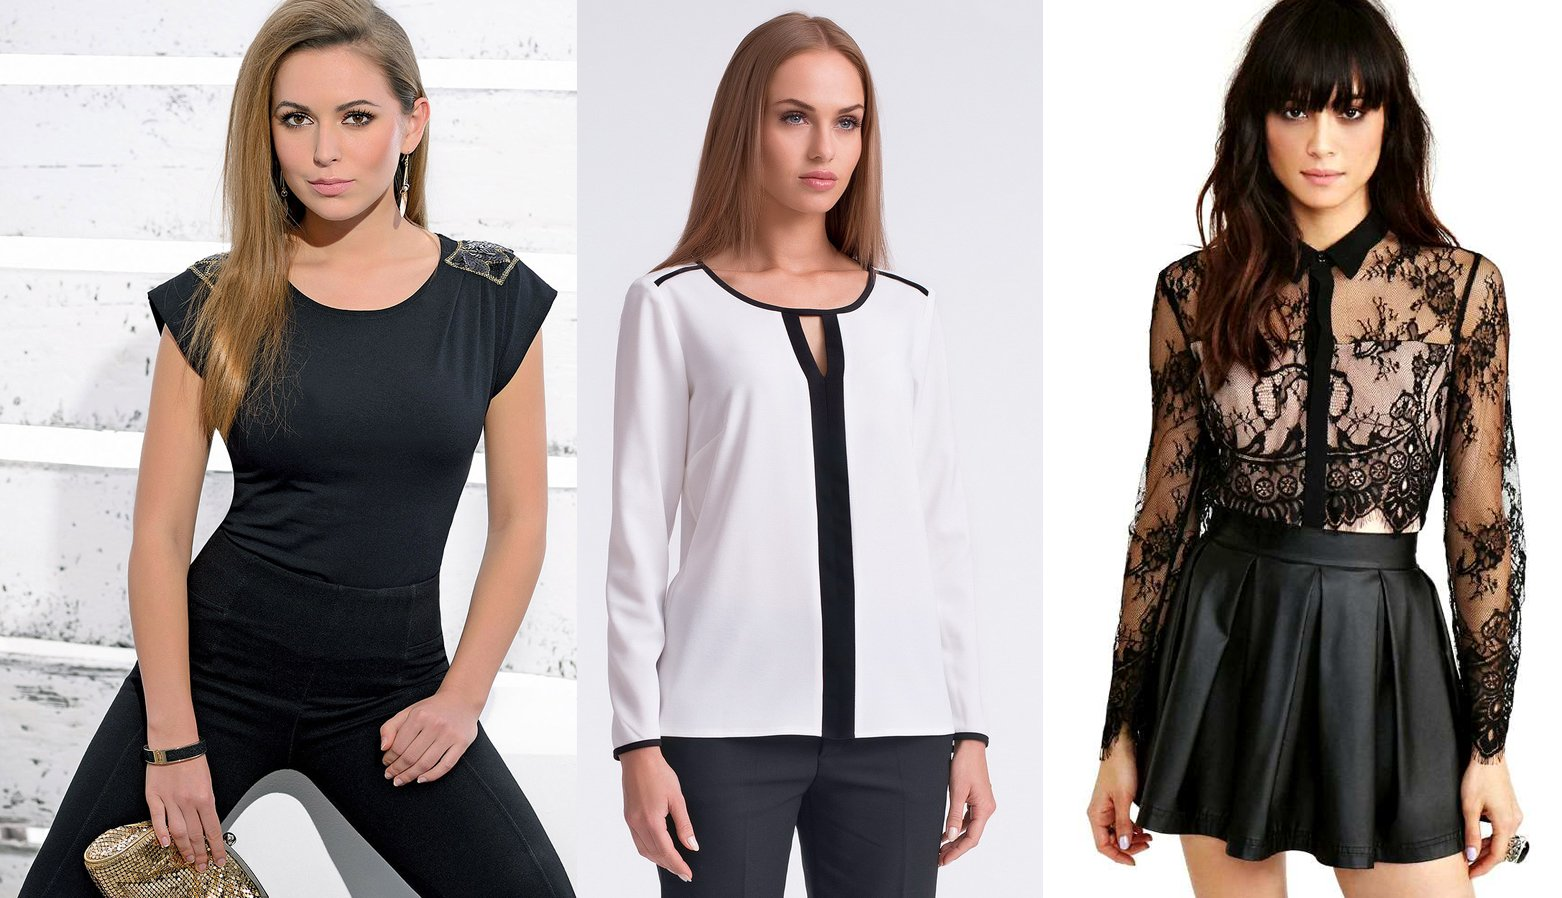 ff661d7324c Шифоновые блузки на 2017 год - модные новинки с фото